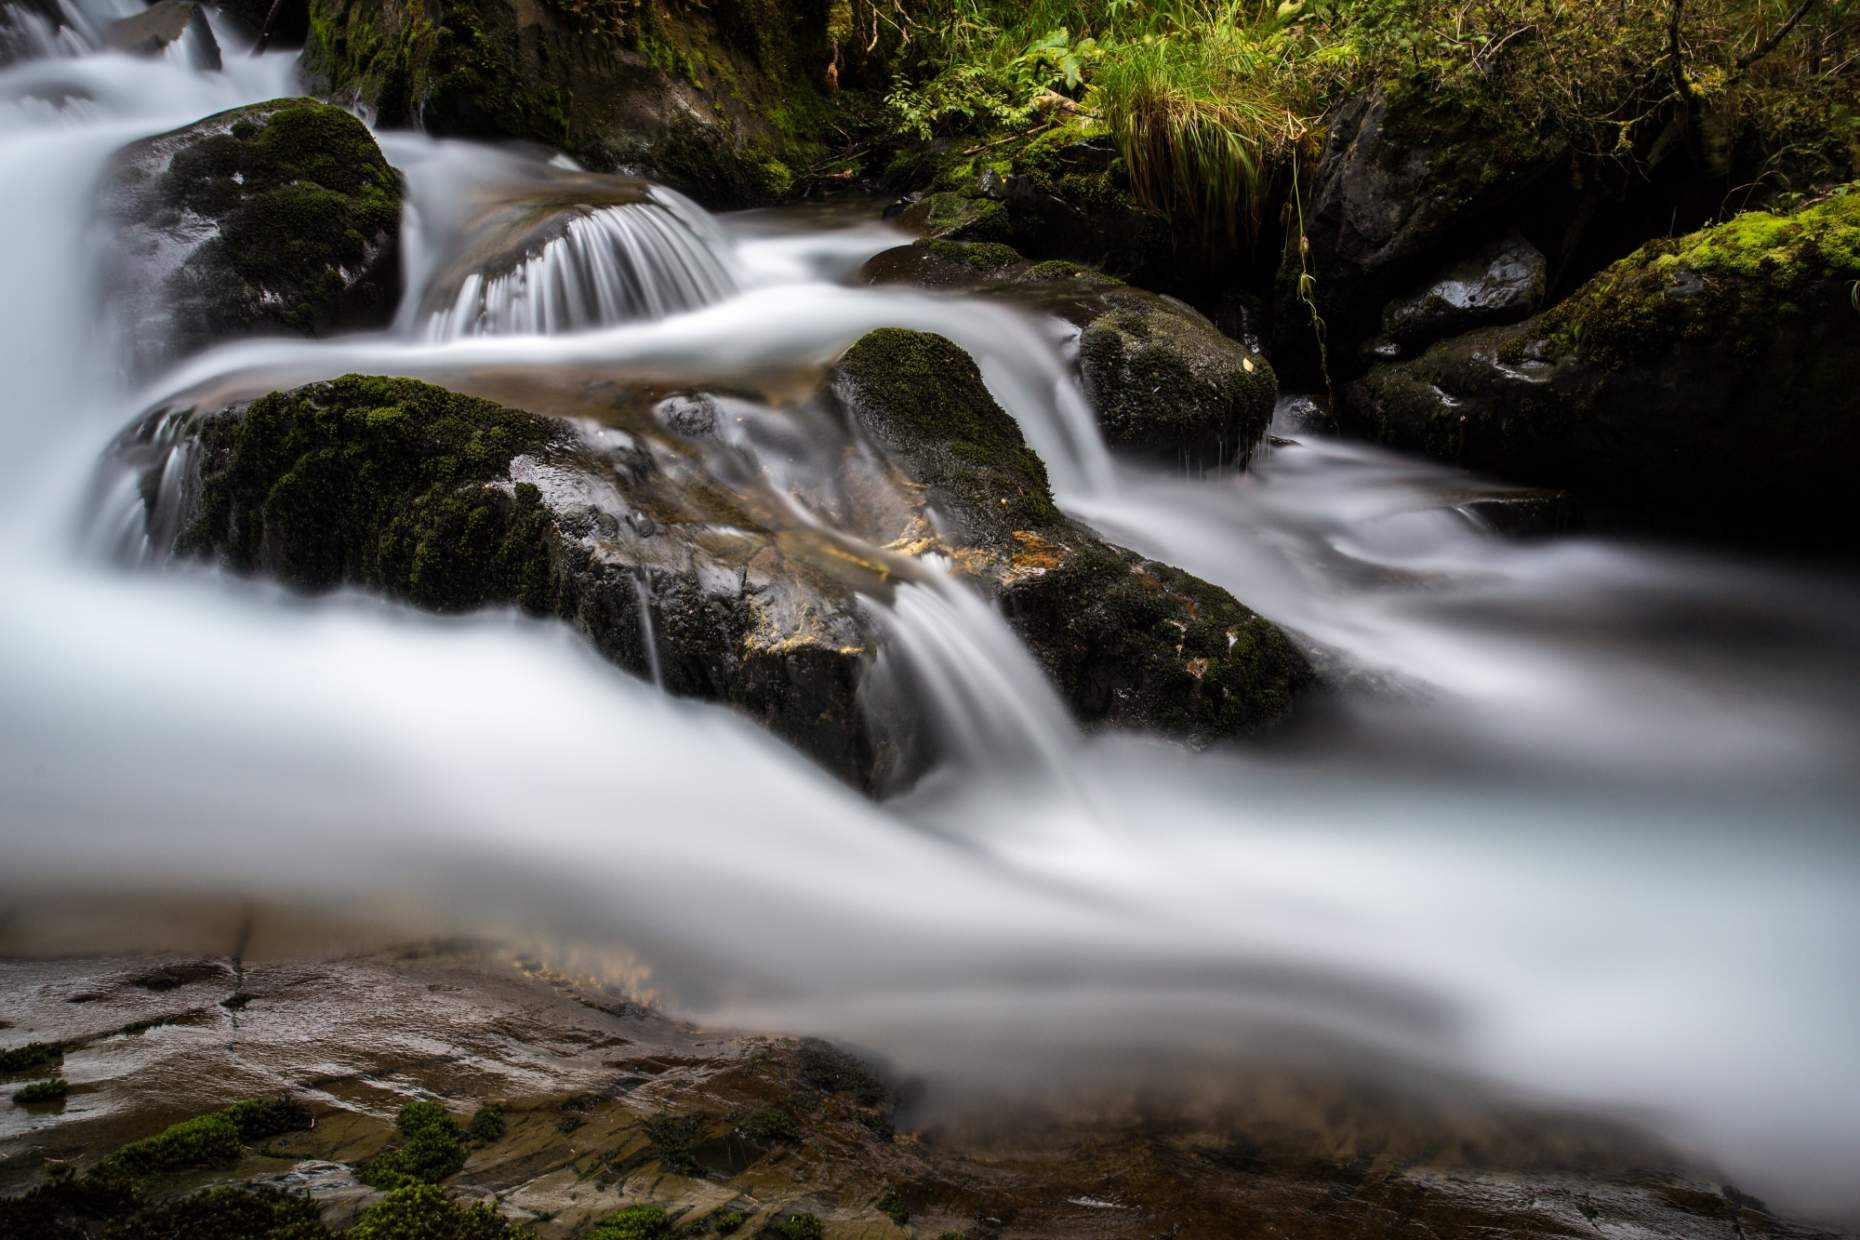 Jeff Schultz Virgin Creek Falls 140901 4 M5032